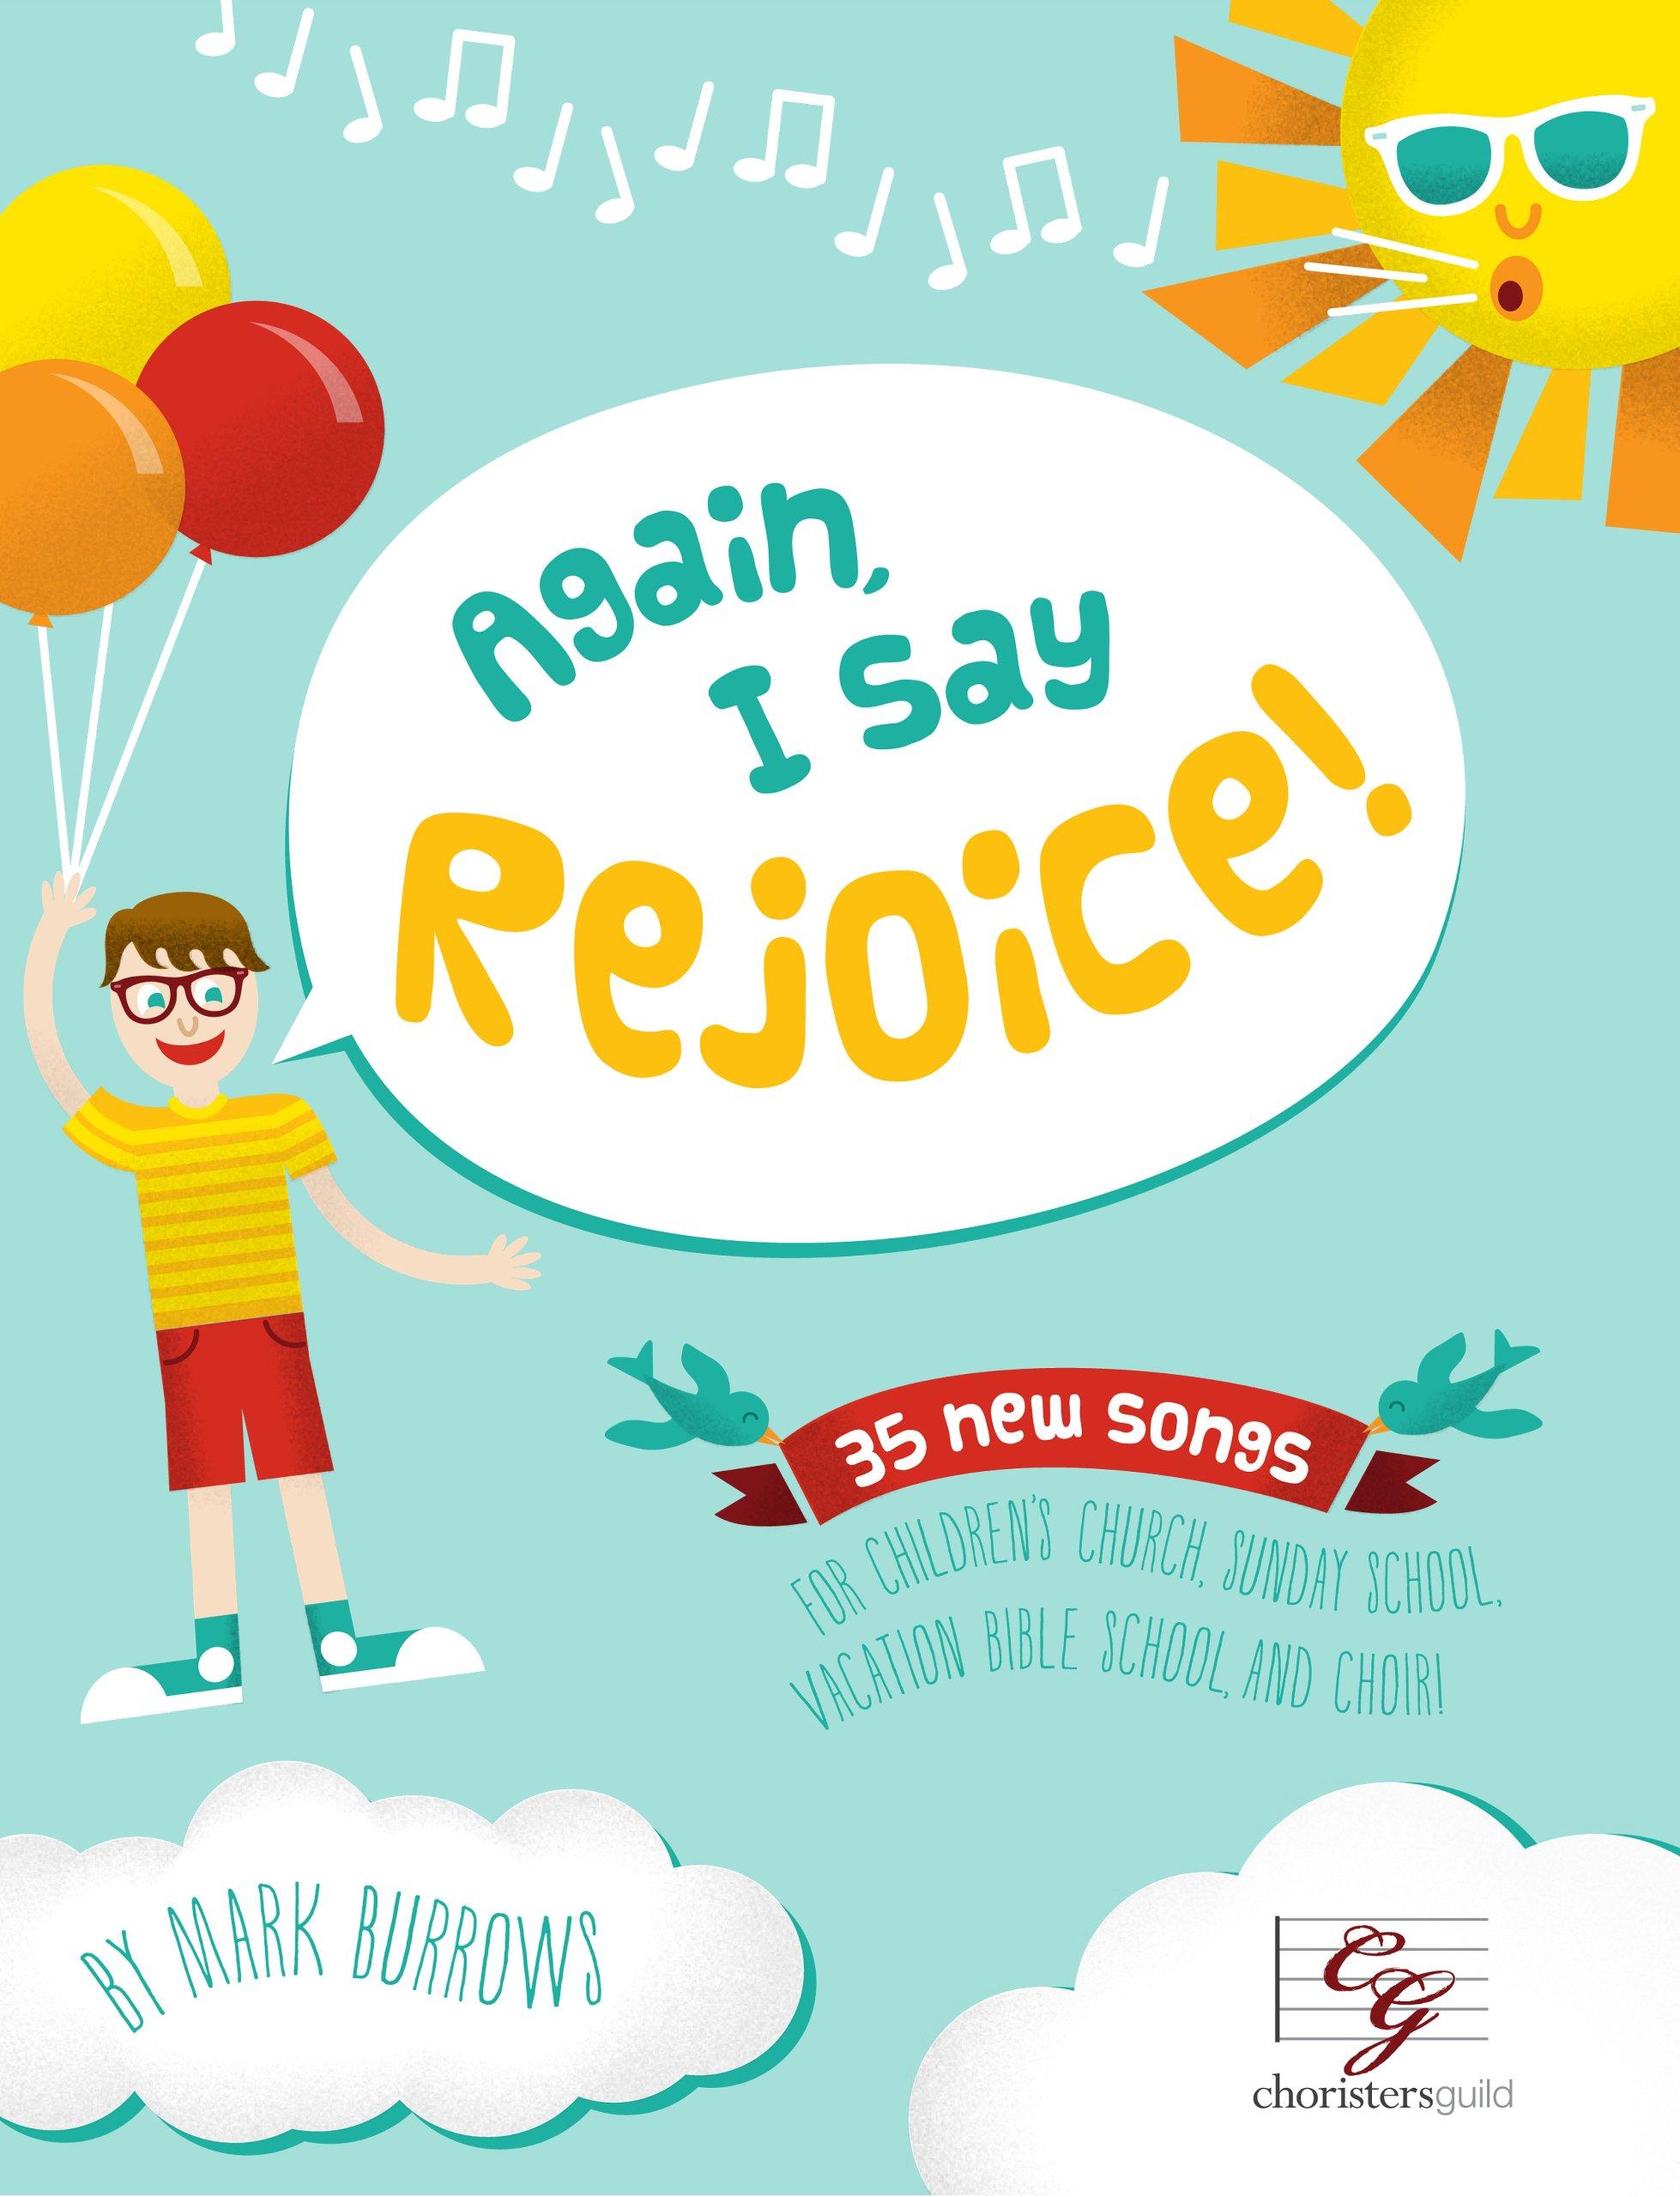 Again, I Say Rejoice! 35 New Songs for Children's Church